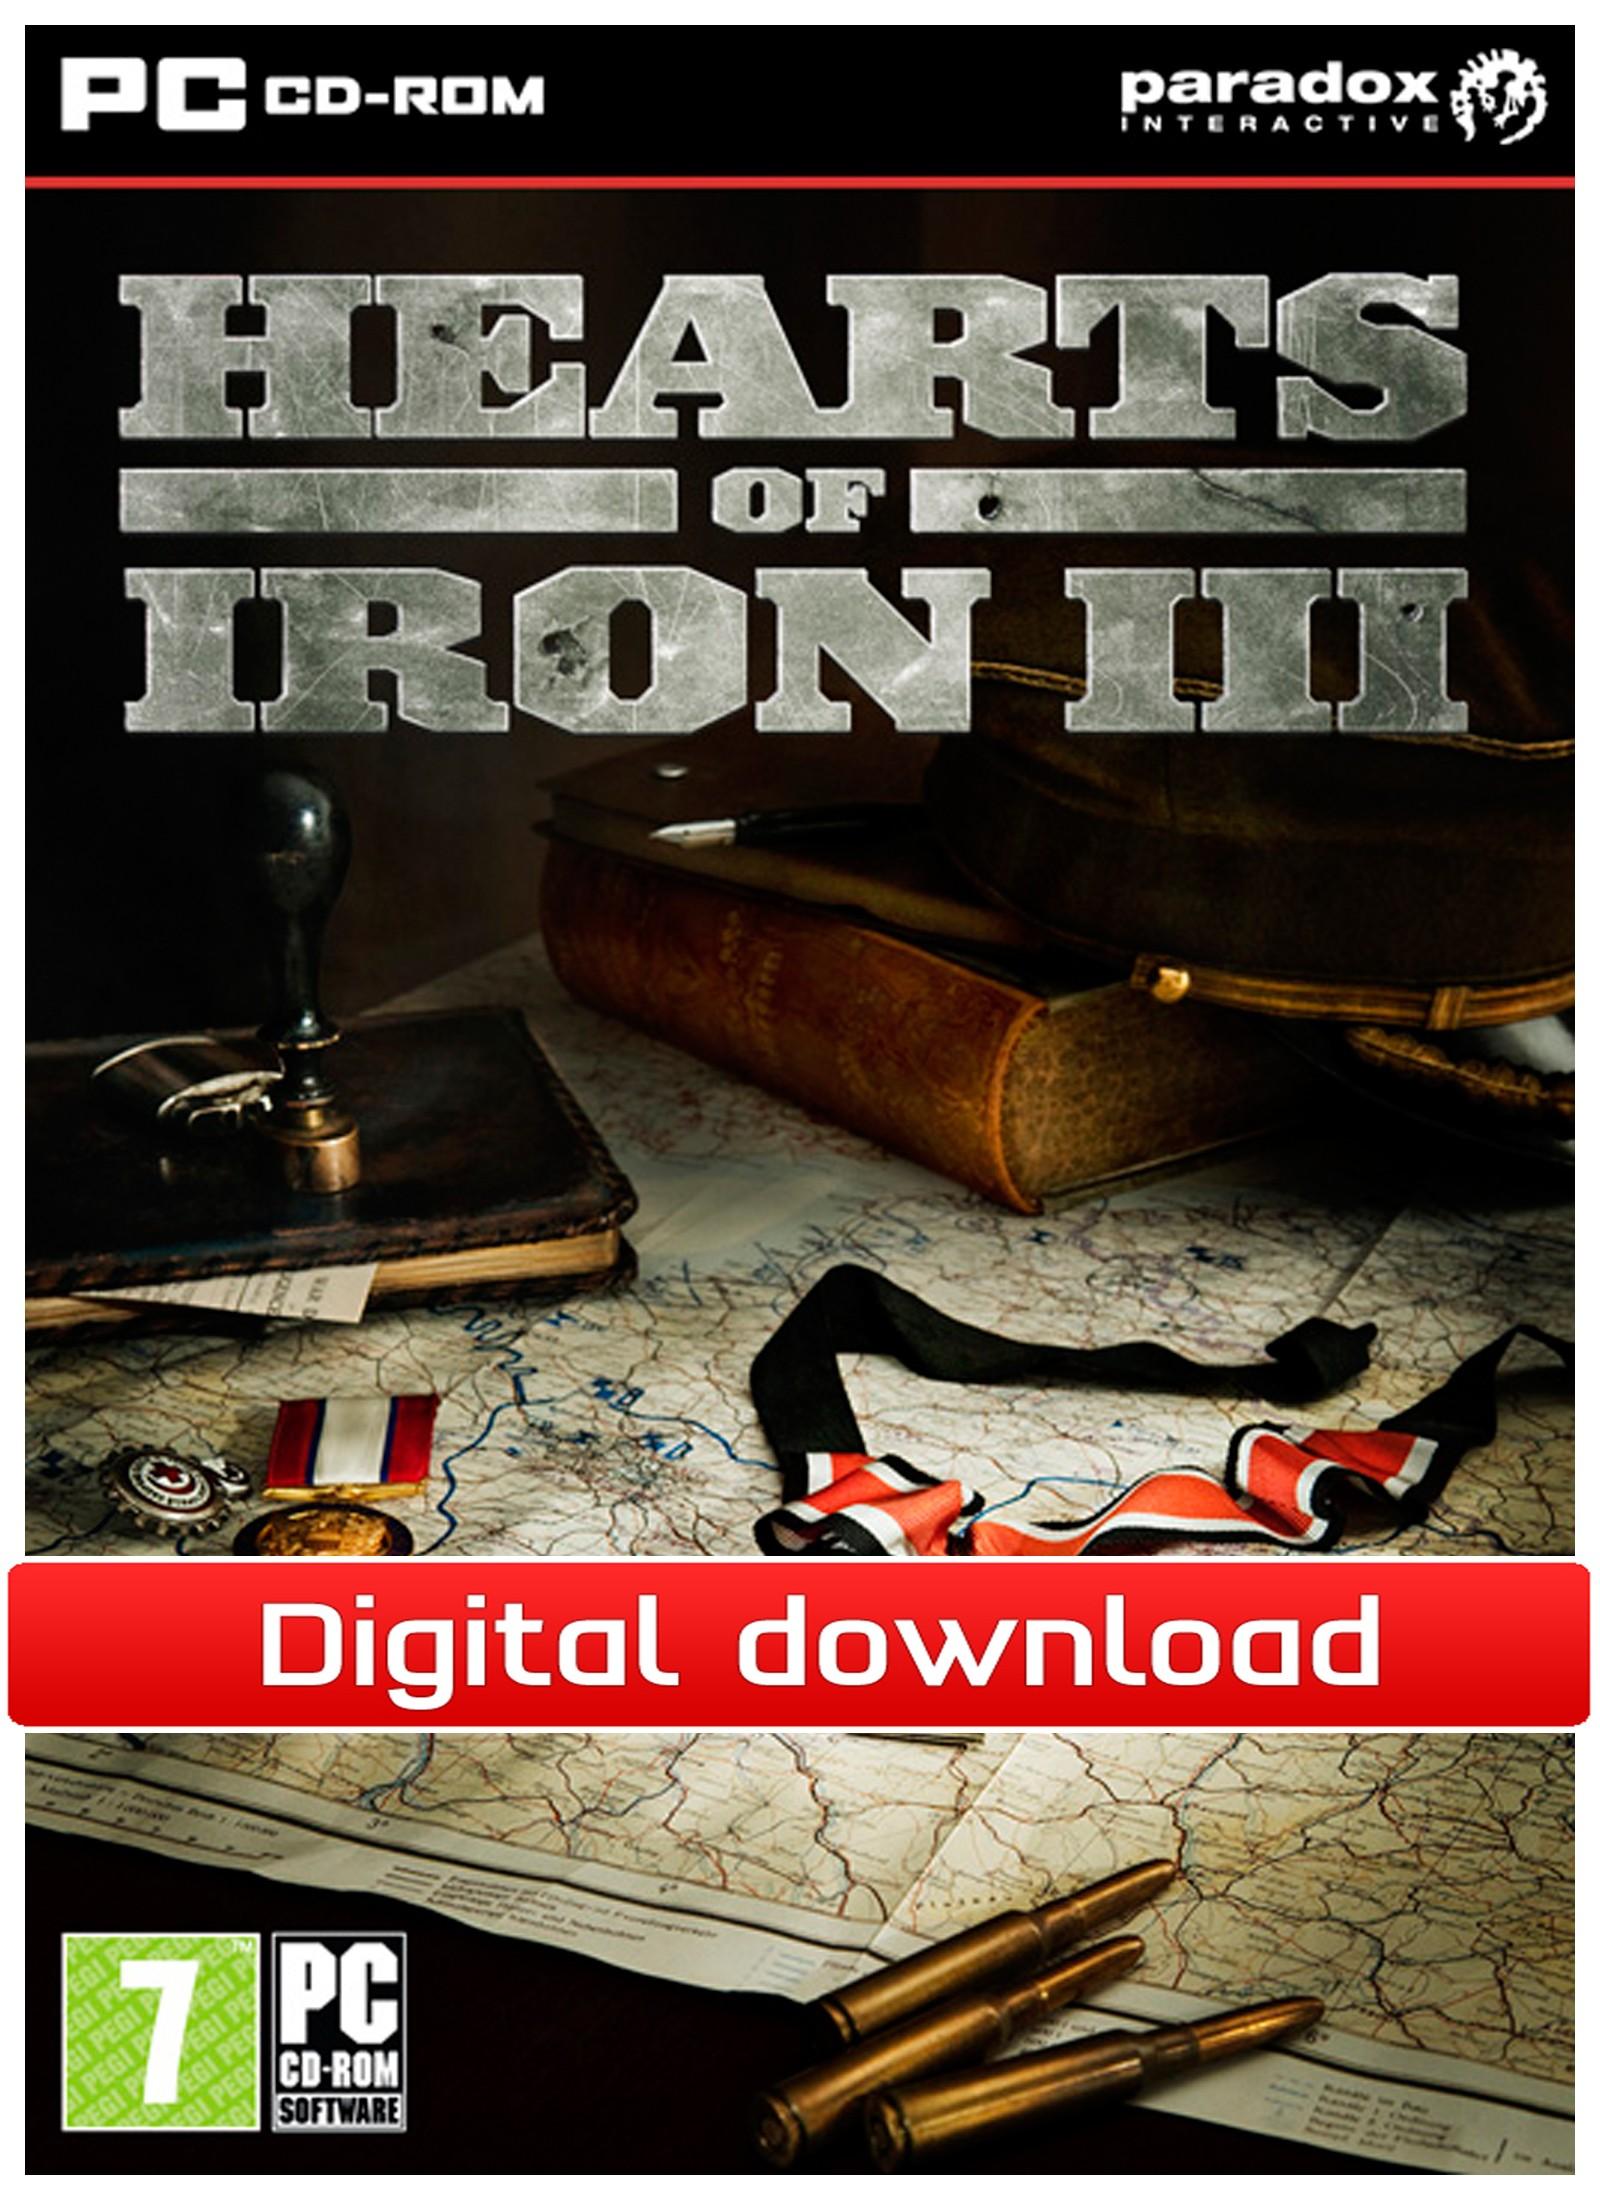 Hearts of Iron III (PC nedlastning) PCDD22636